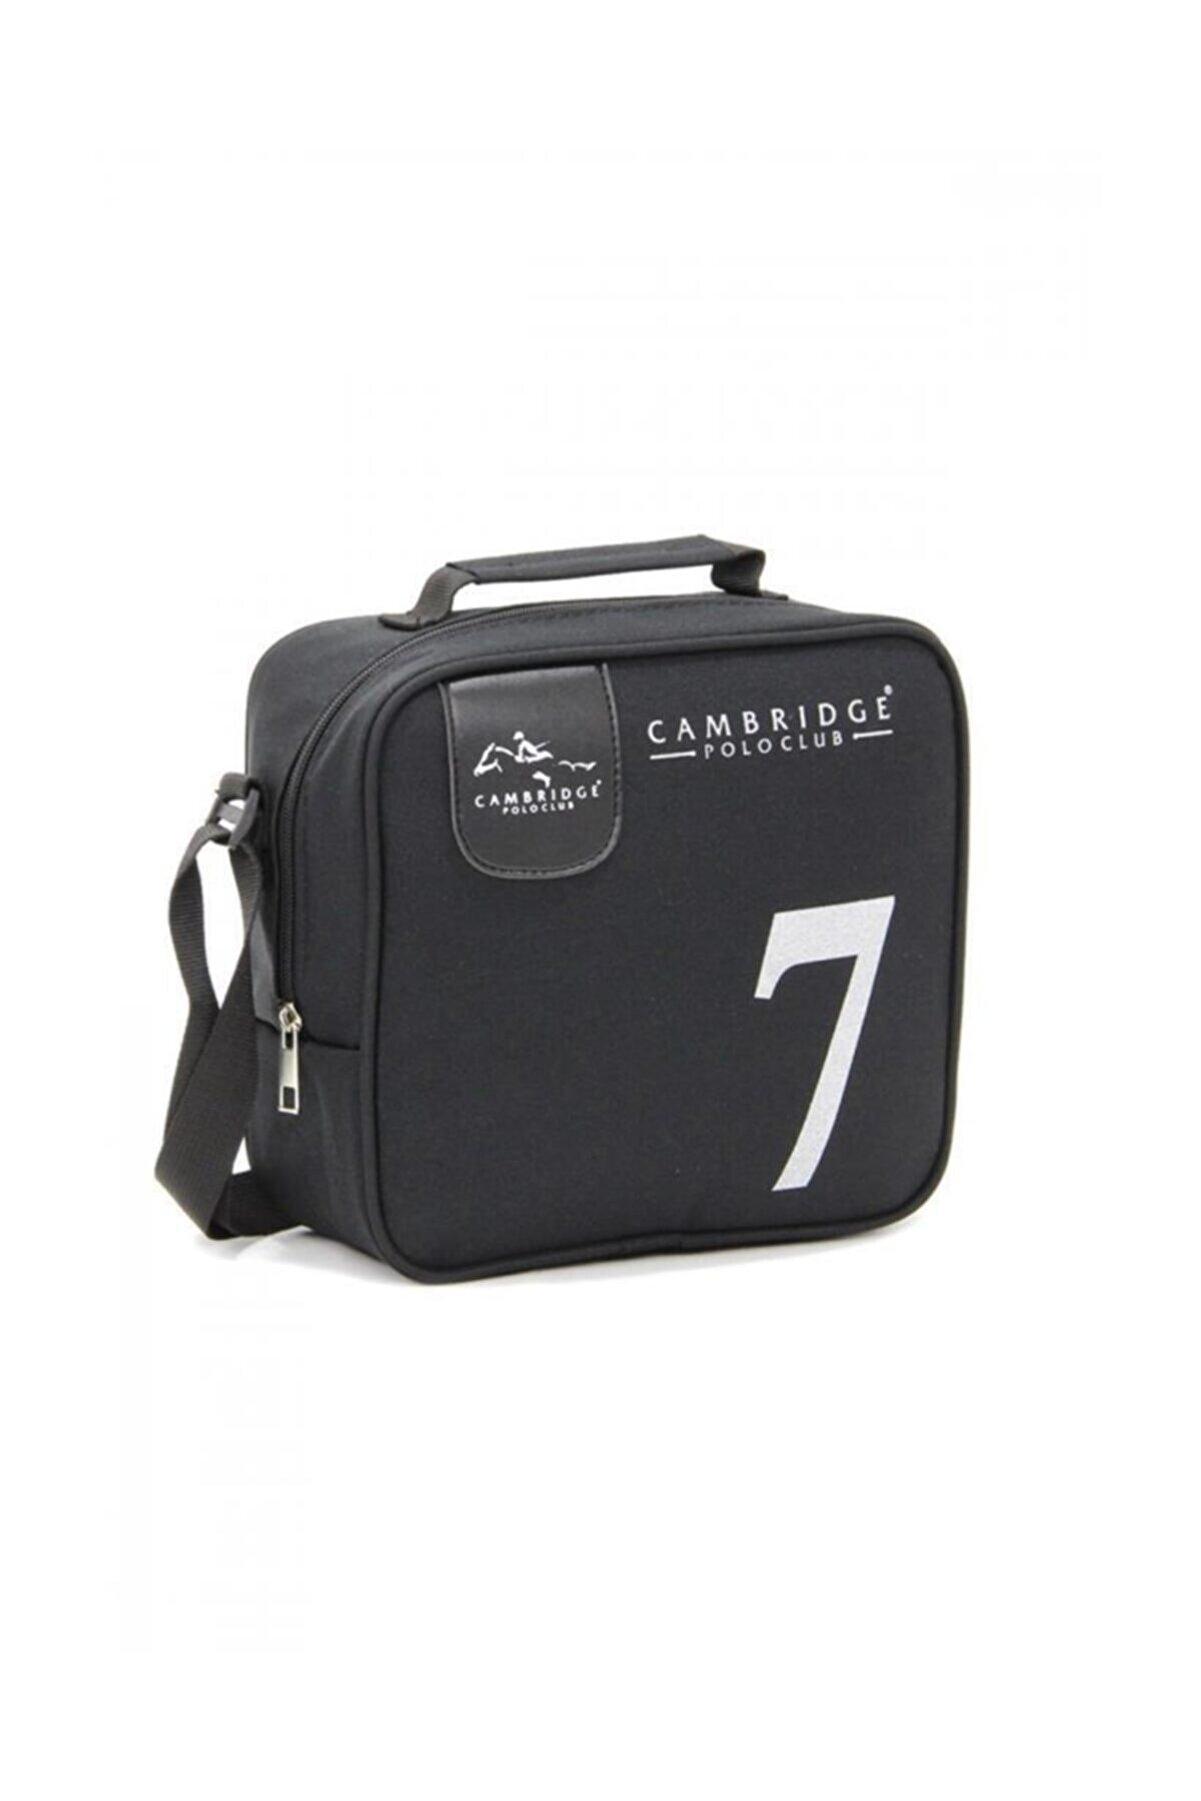 Polo Cambridge Club Beslenme Çantası Plbsl80010 Siyah